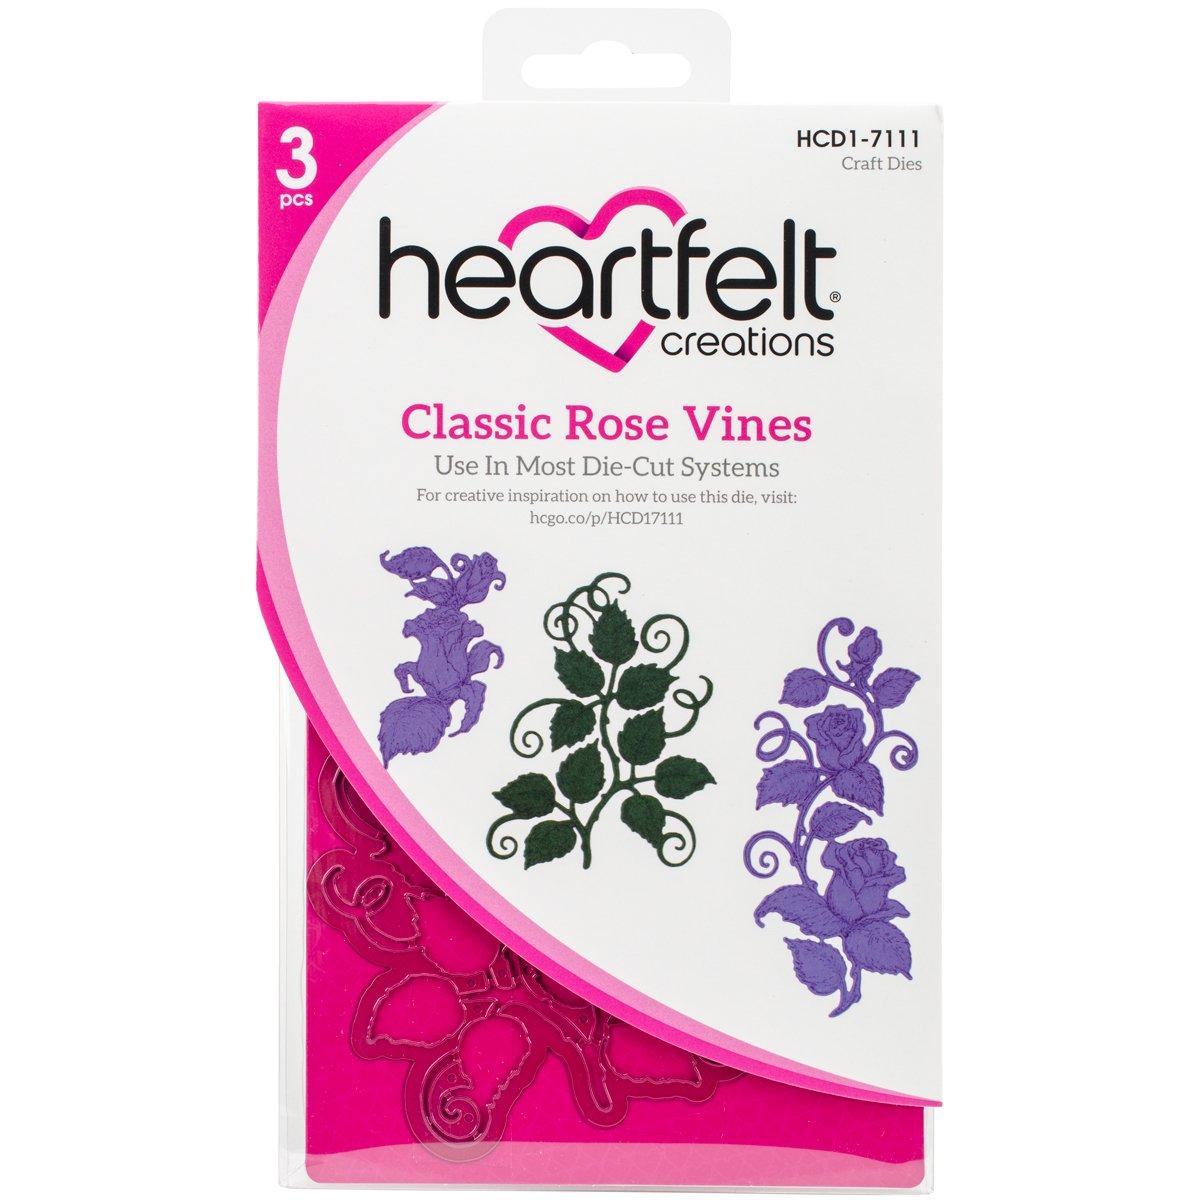 Heartfelt Creations Classic Rose Vines 1.5 to 4.75 Emboss Dies